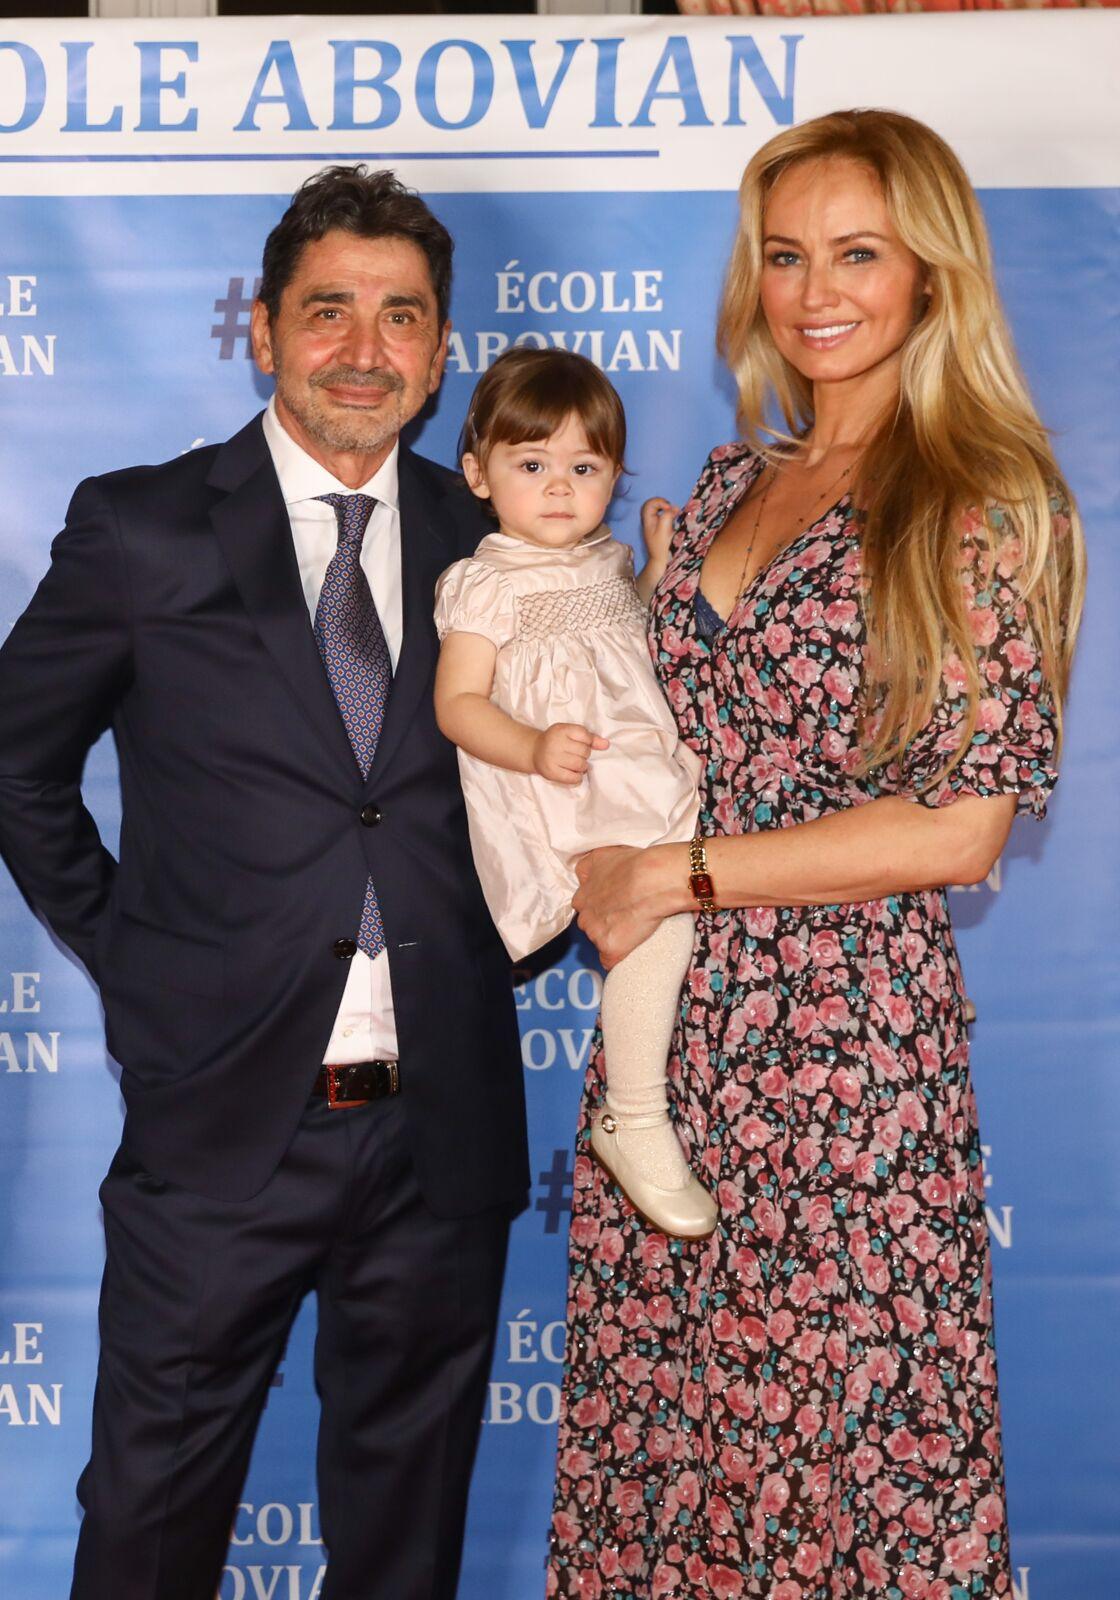 Aram Ohanian, Adriana Karembeu et leur fille Nina Ohanian le 26 octobre 2019